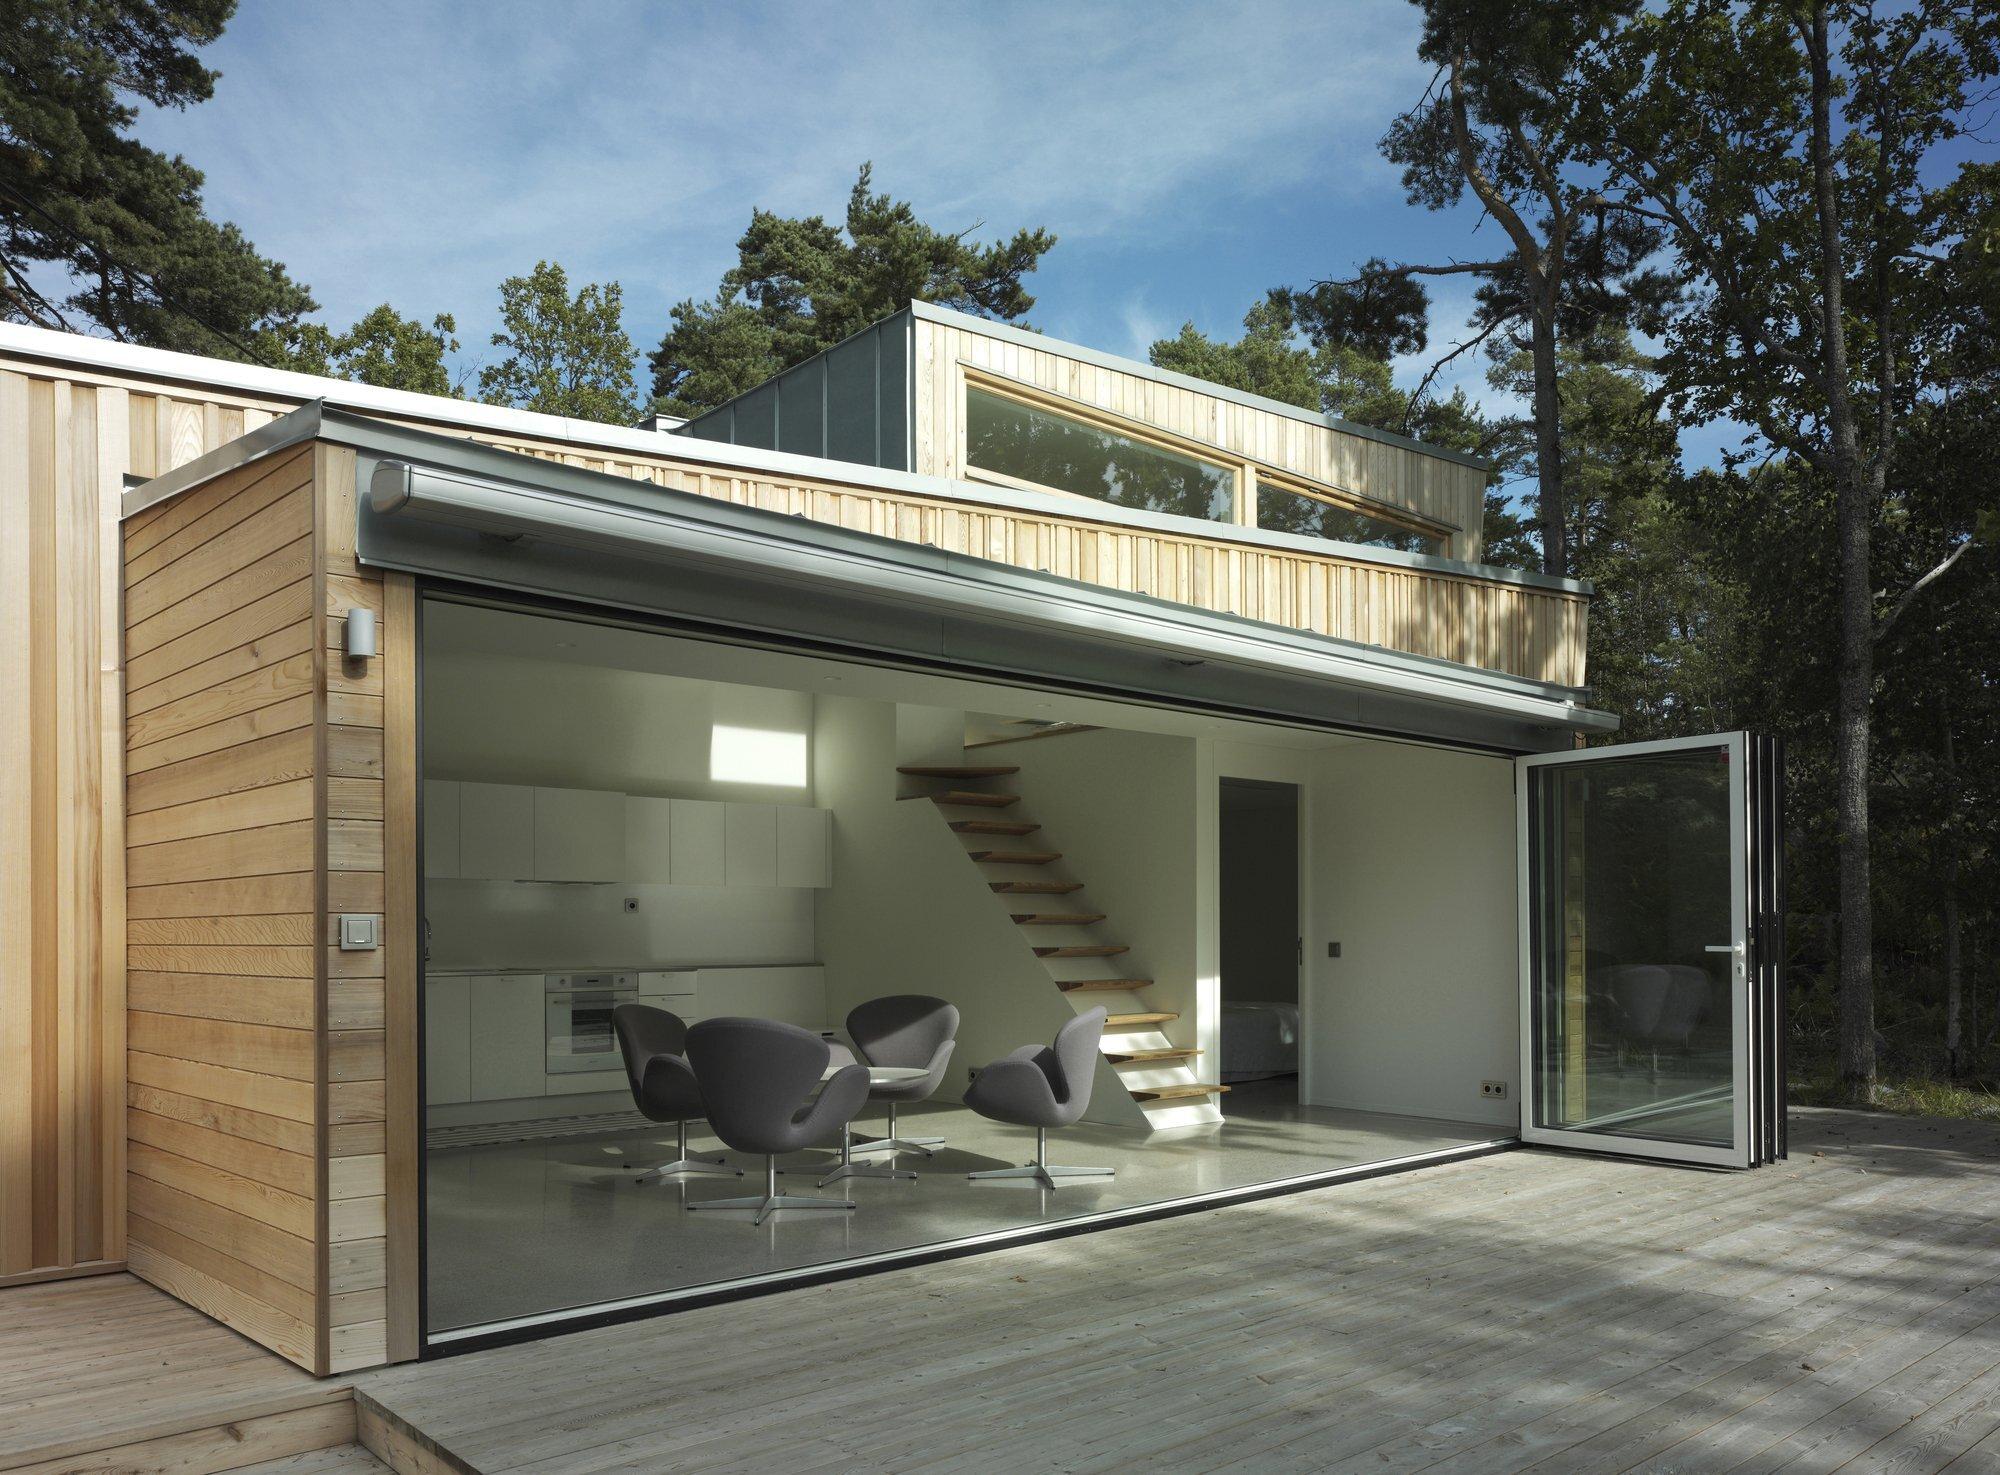 The Wood House - Schlyter + Gezelius Arkitektkontor - Small House - Sweden - Exterior Decking - Humble Homes